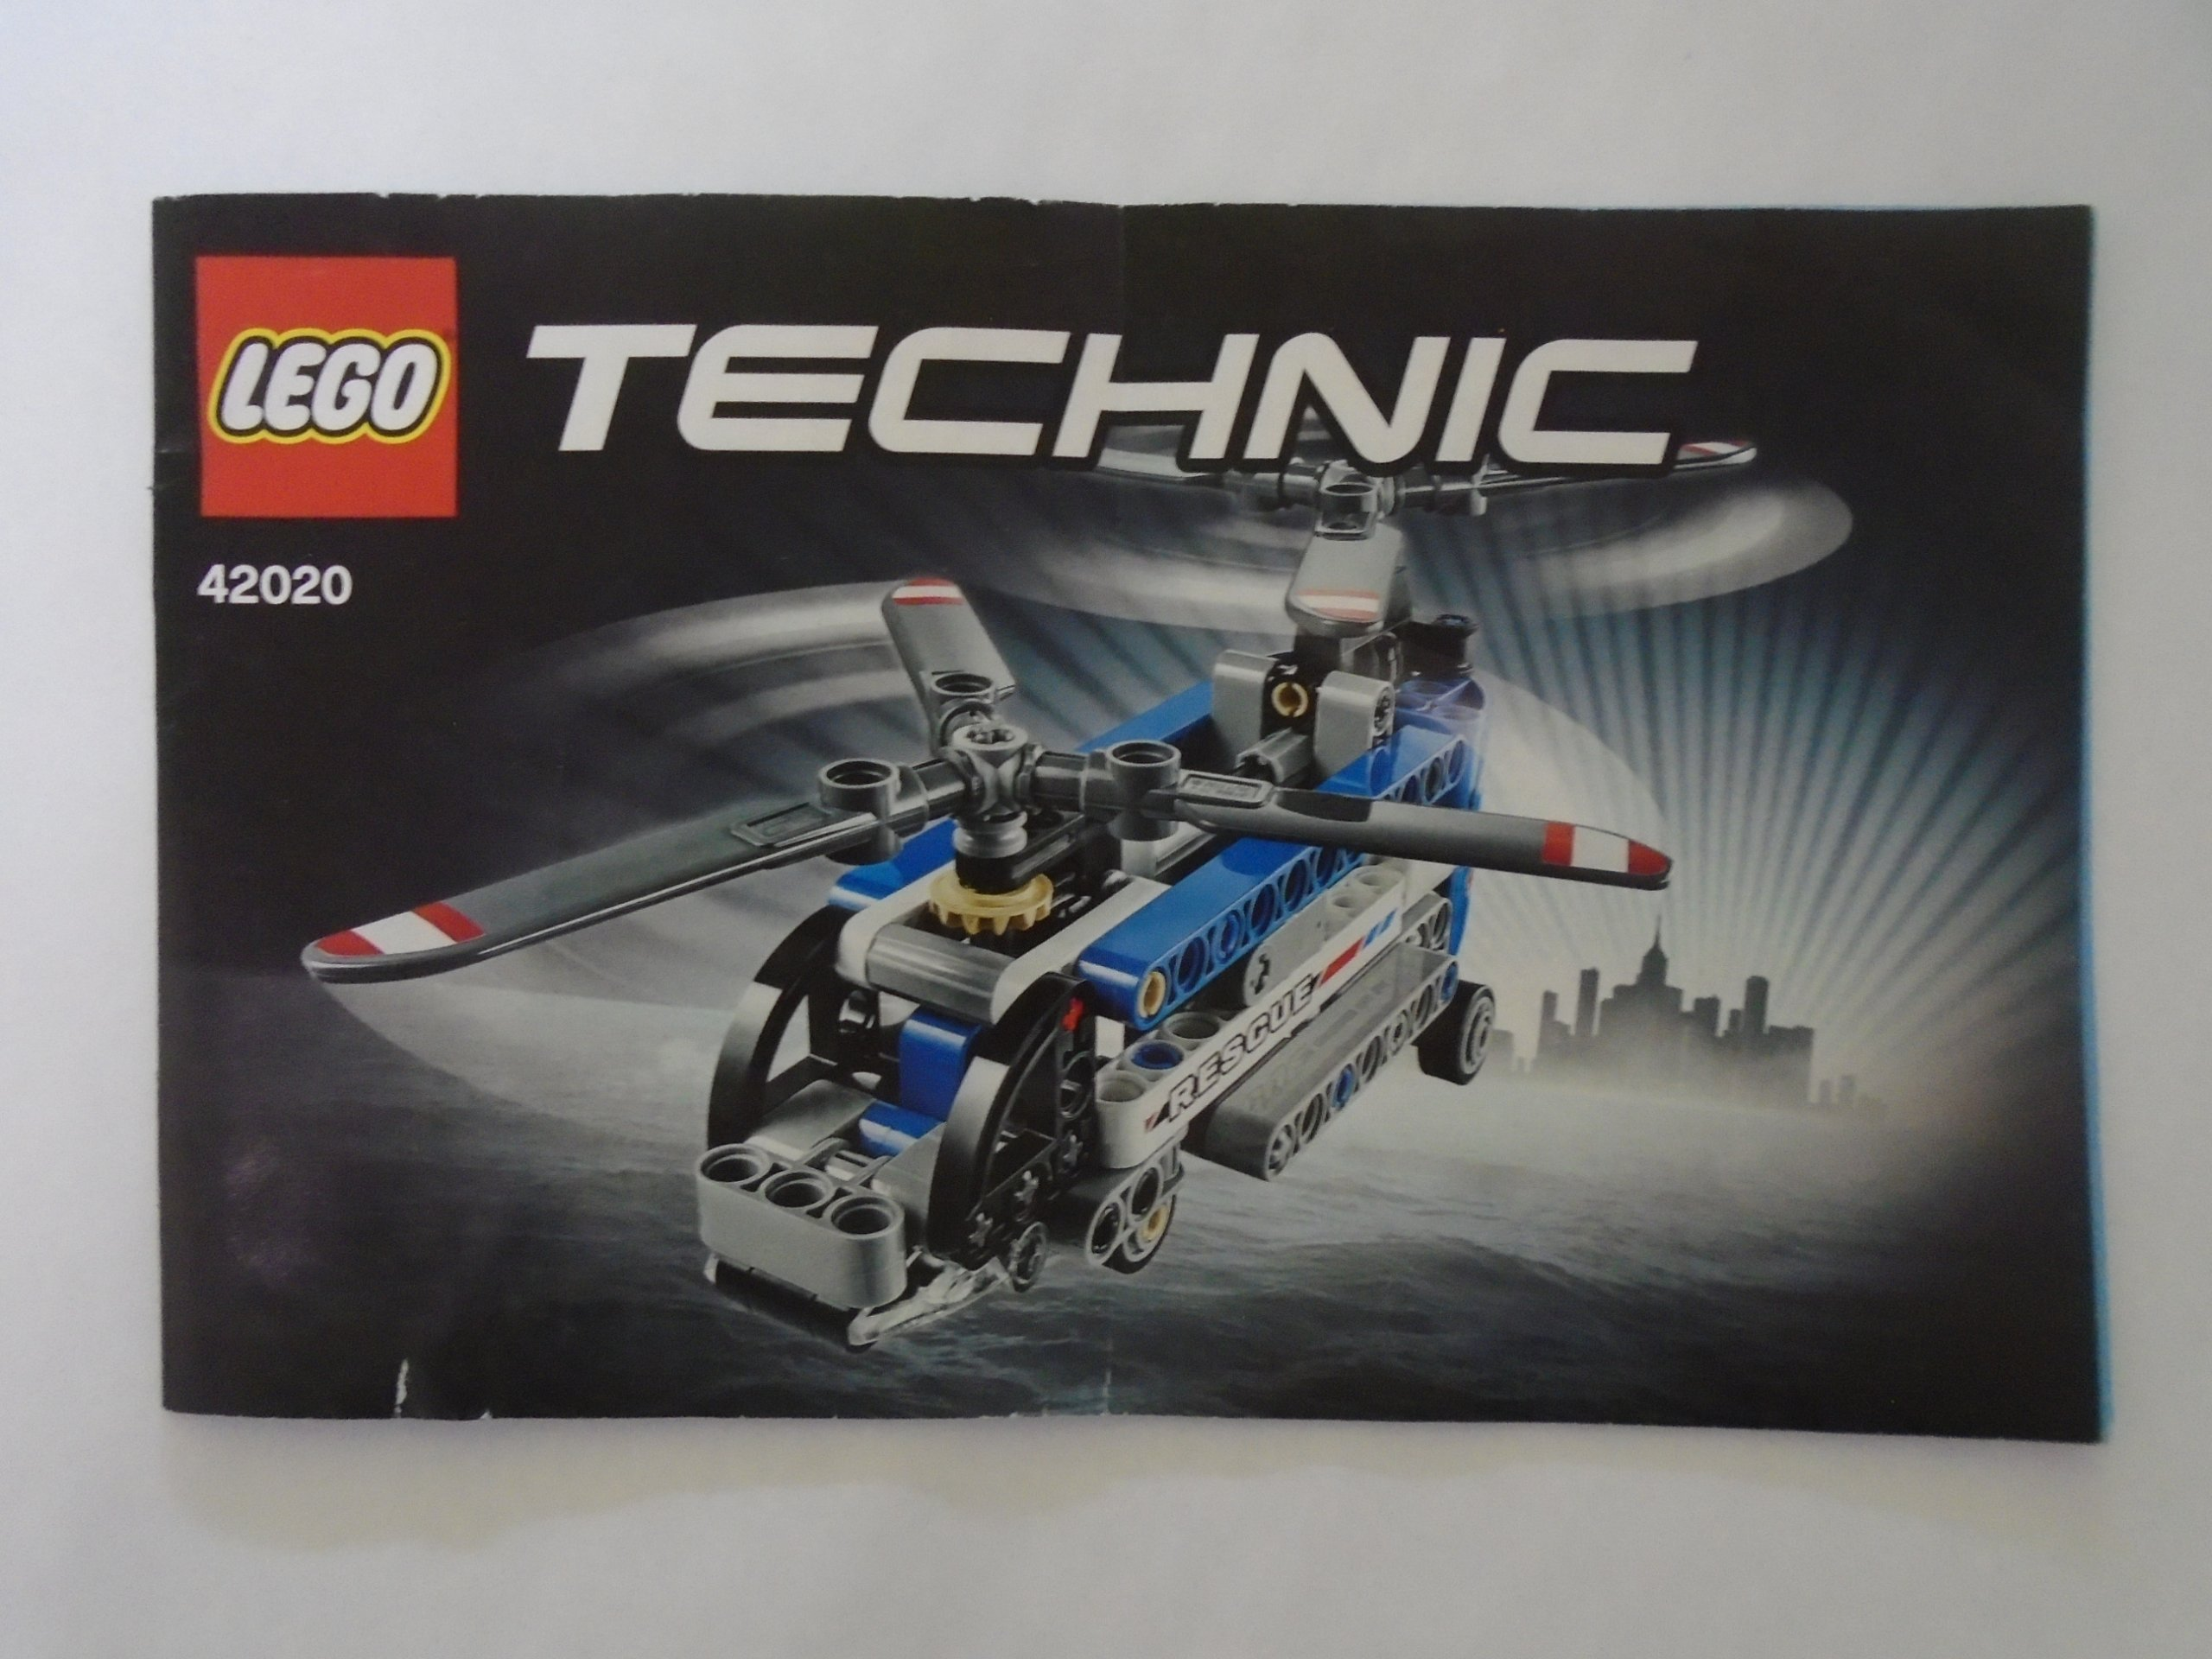 Lego Instrukcja Technic Twinrotor Helicopter 42020 7281379596